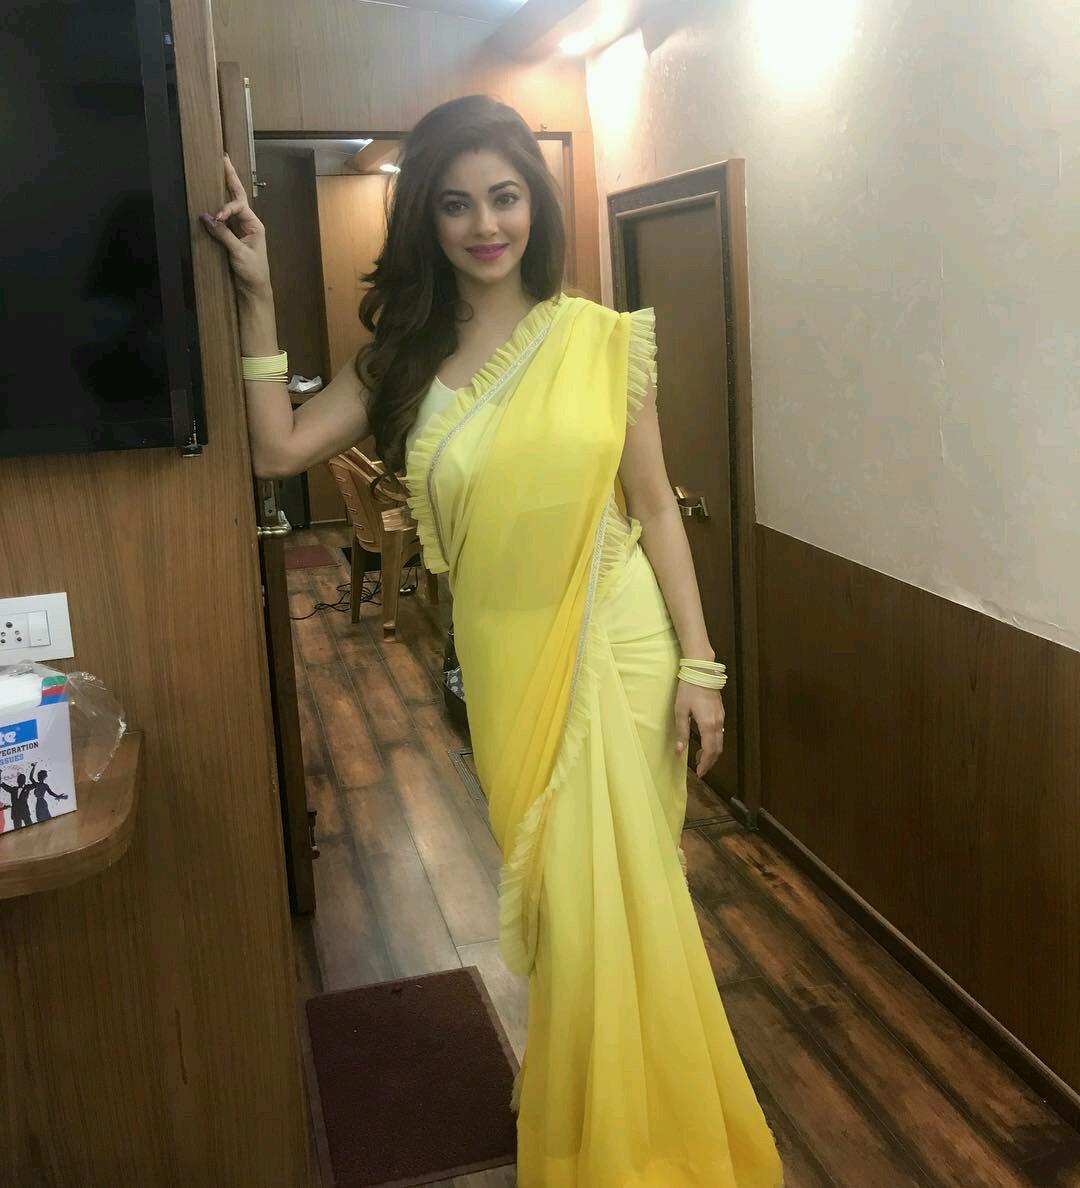 Desi Hot Beauties Girls Sexy,Hot Boobs,Thighs,Navel,Back -4263